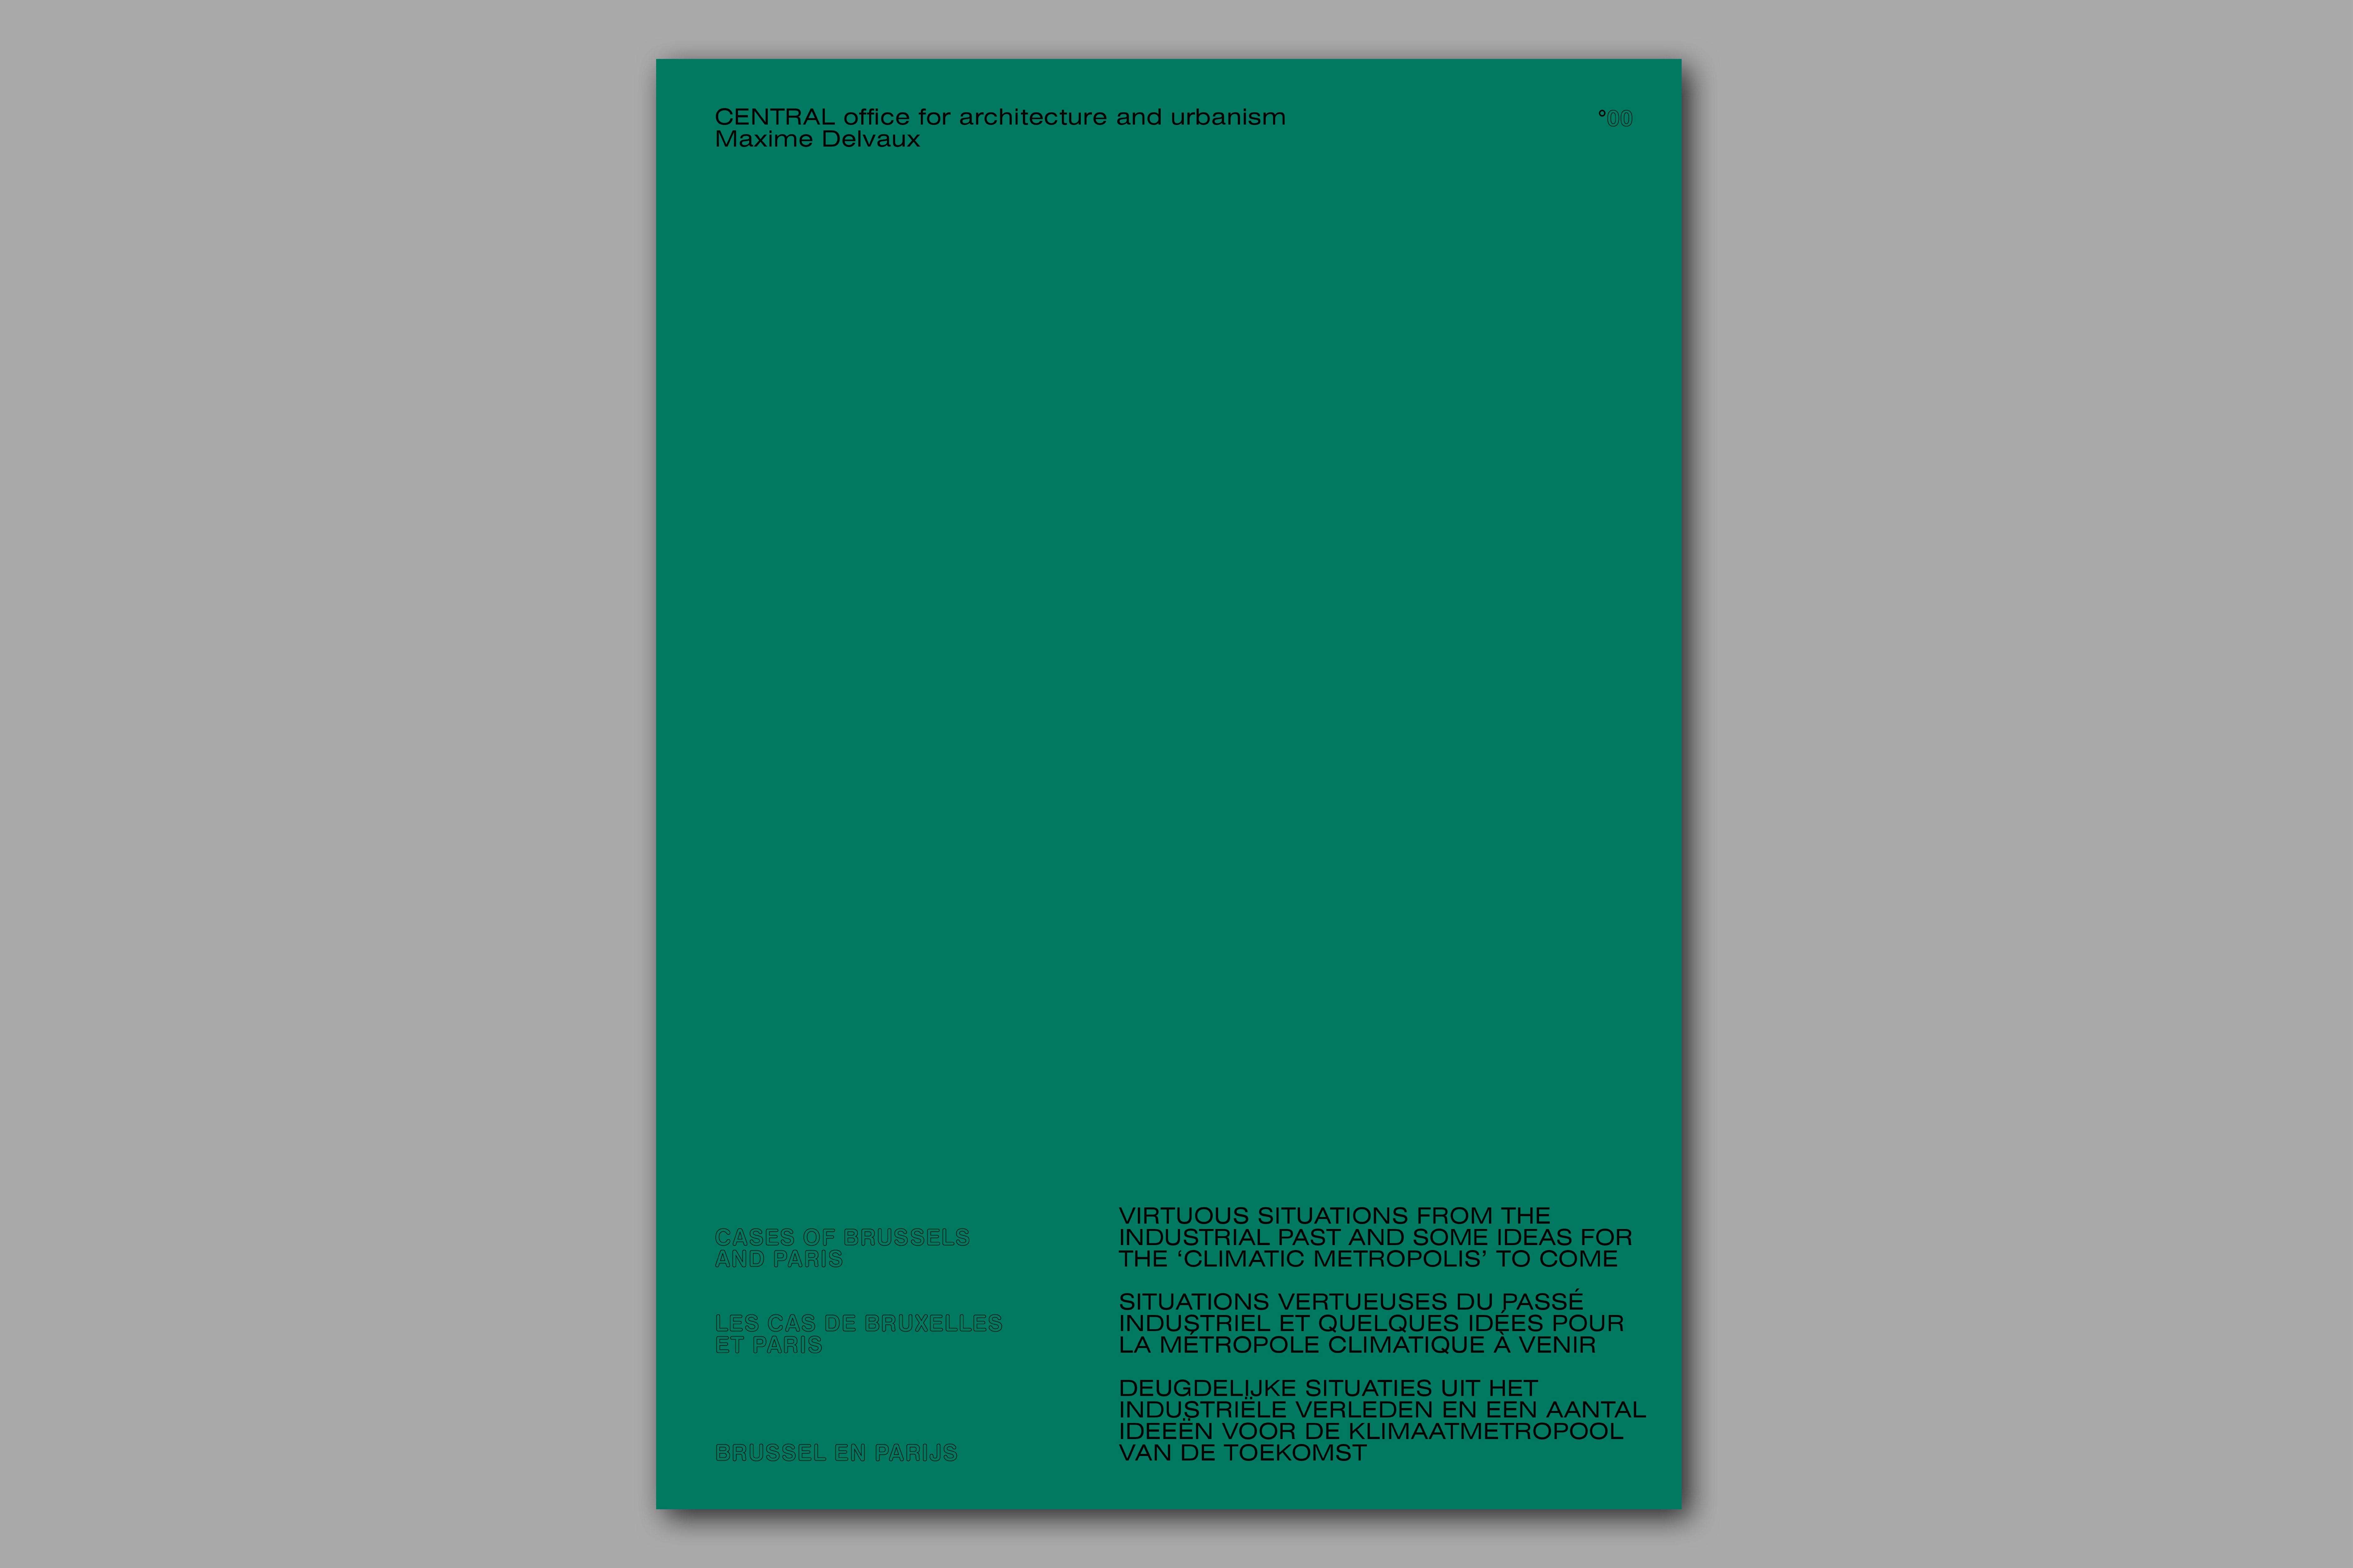 Spiksplinternieuw edcat – CENTRAL office for architecture and urbanism UV-45